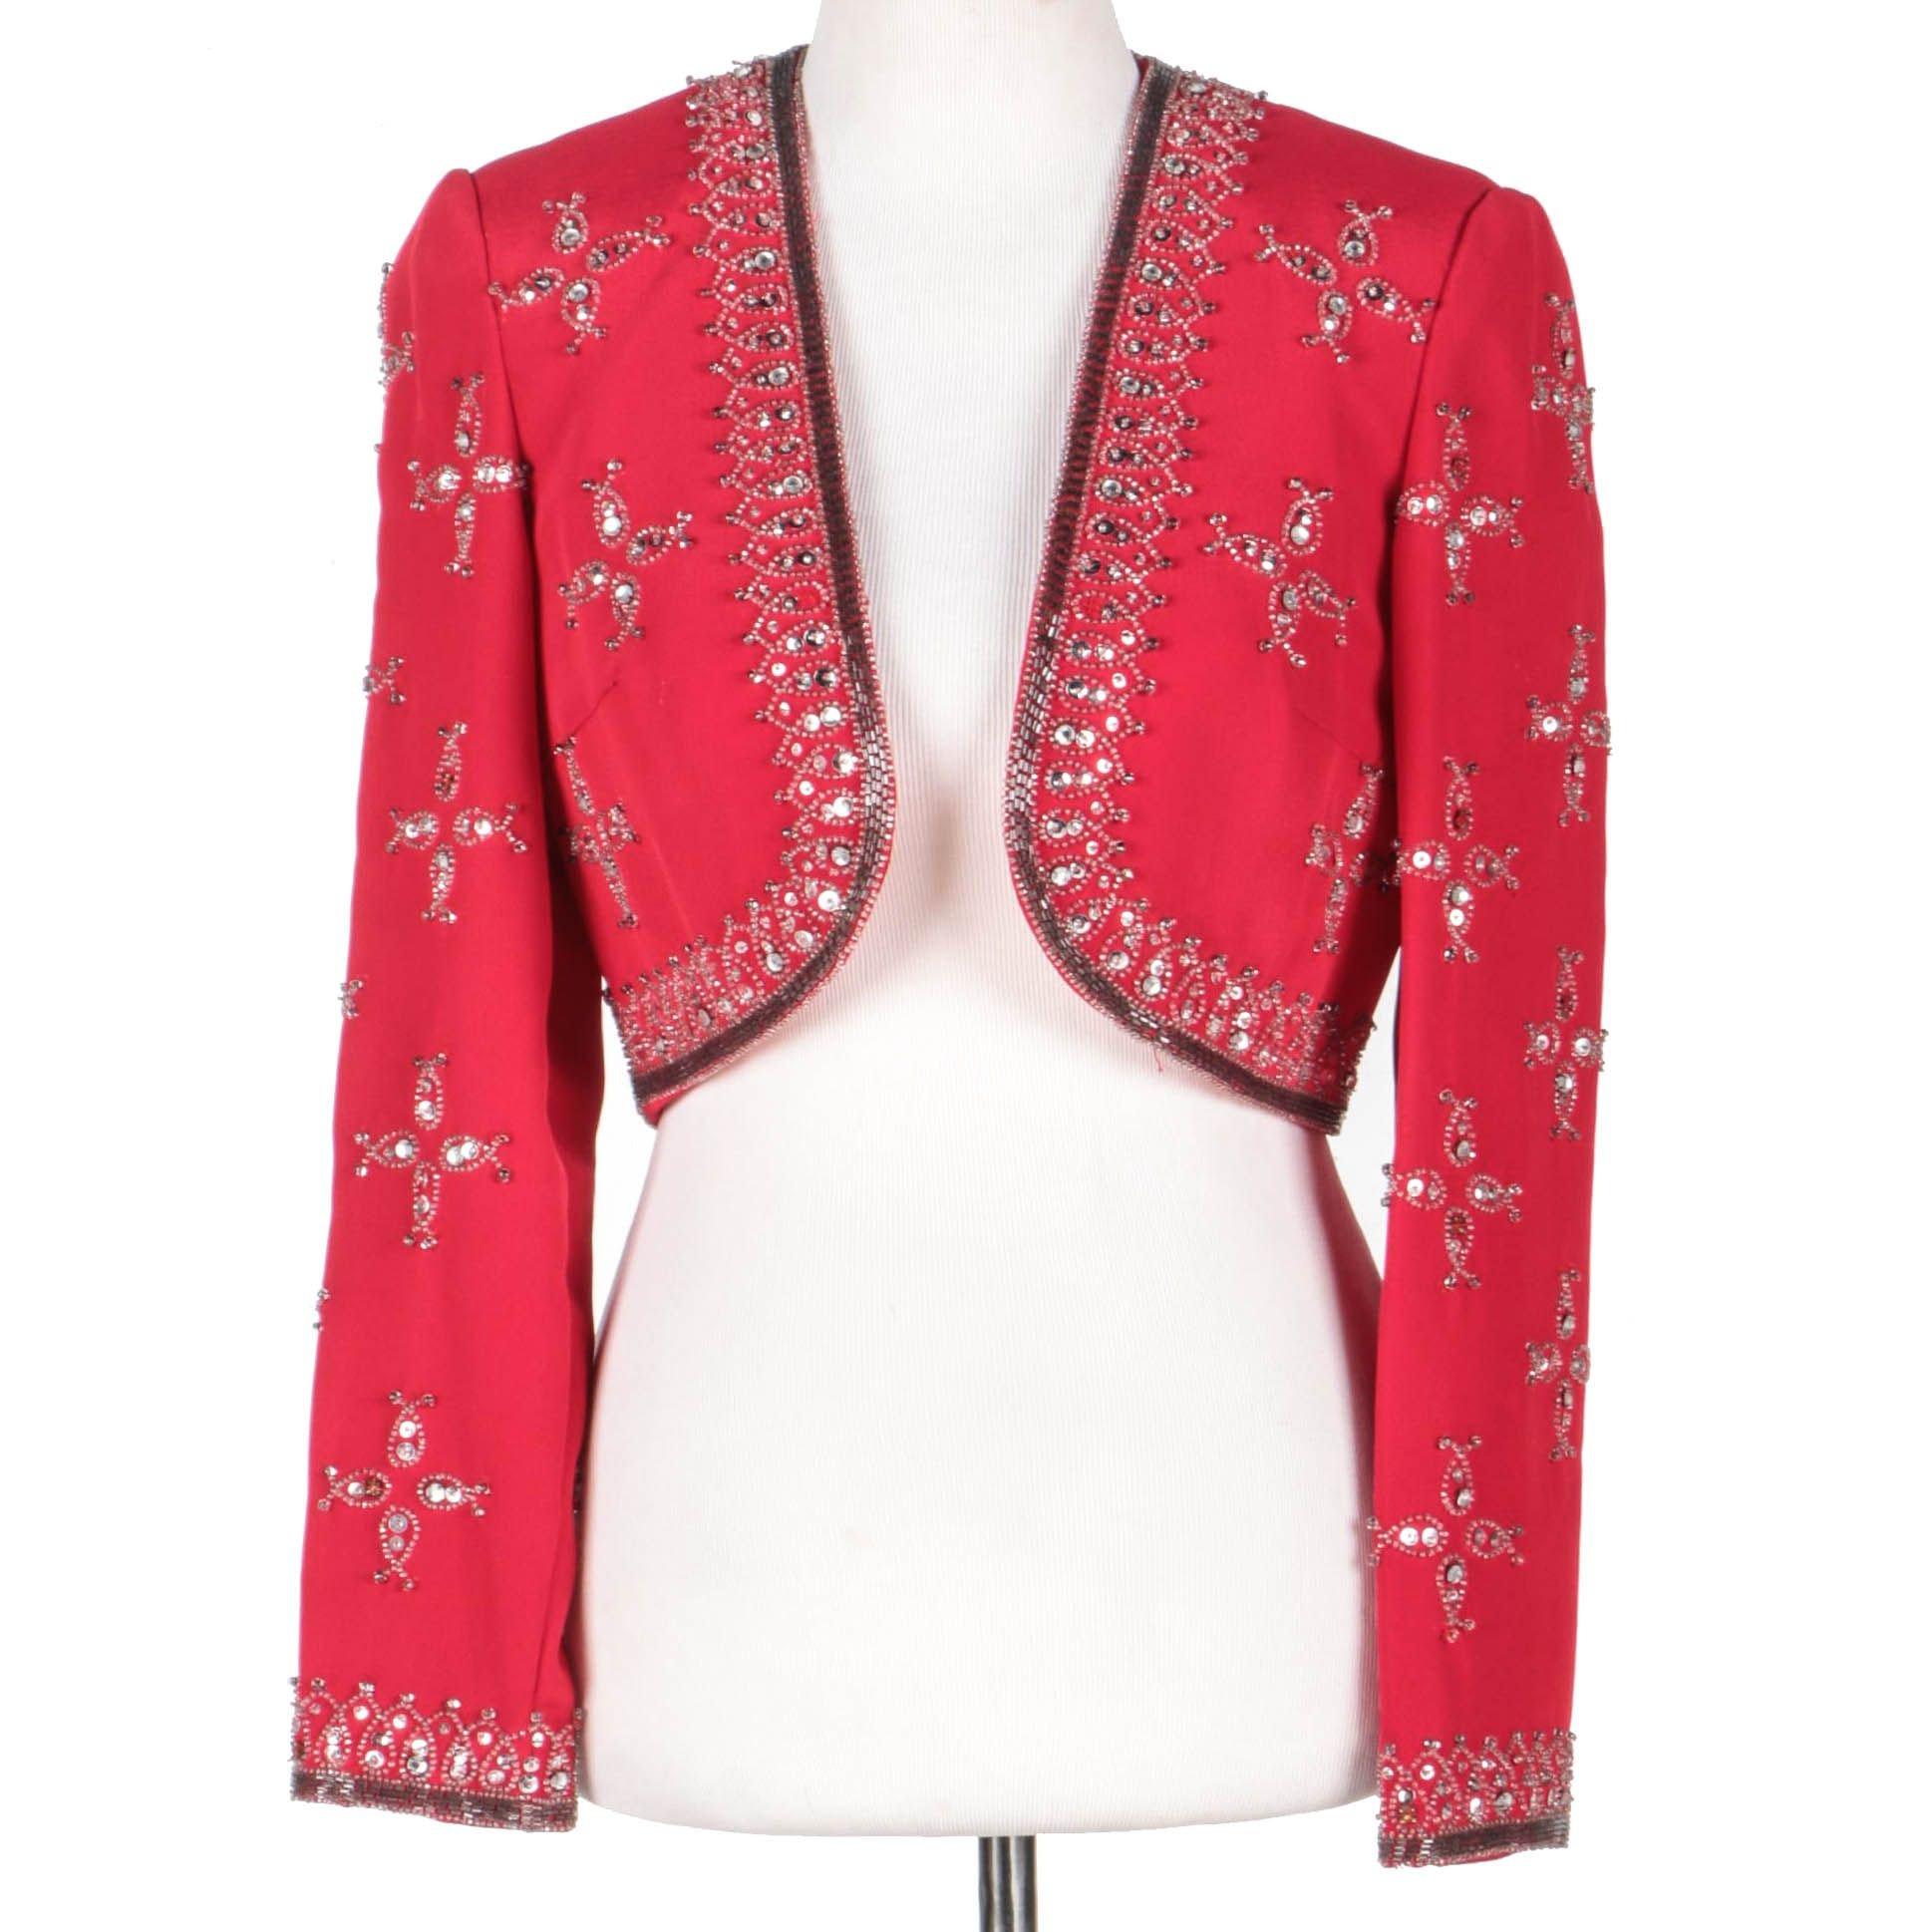 Women's Vintage Victoria Royal Ltd. Embellished Red Bolero Jacket